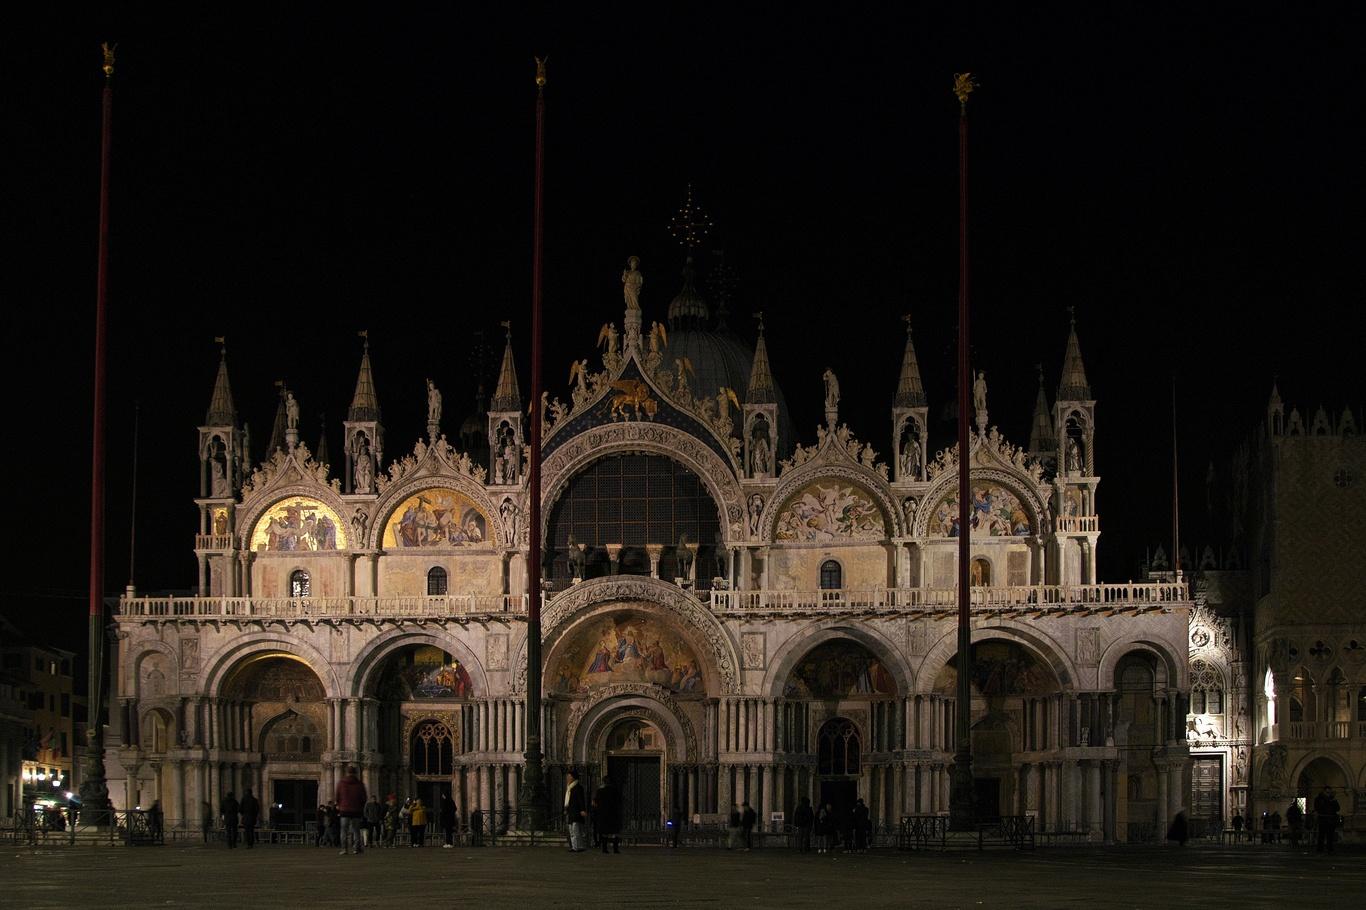 Bazilika sv. Marka